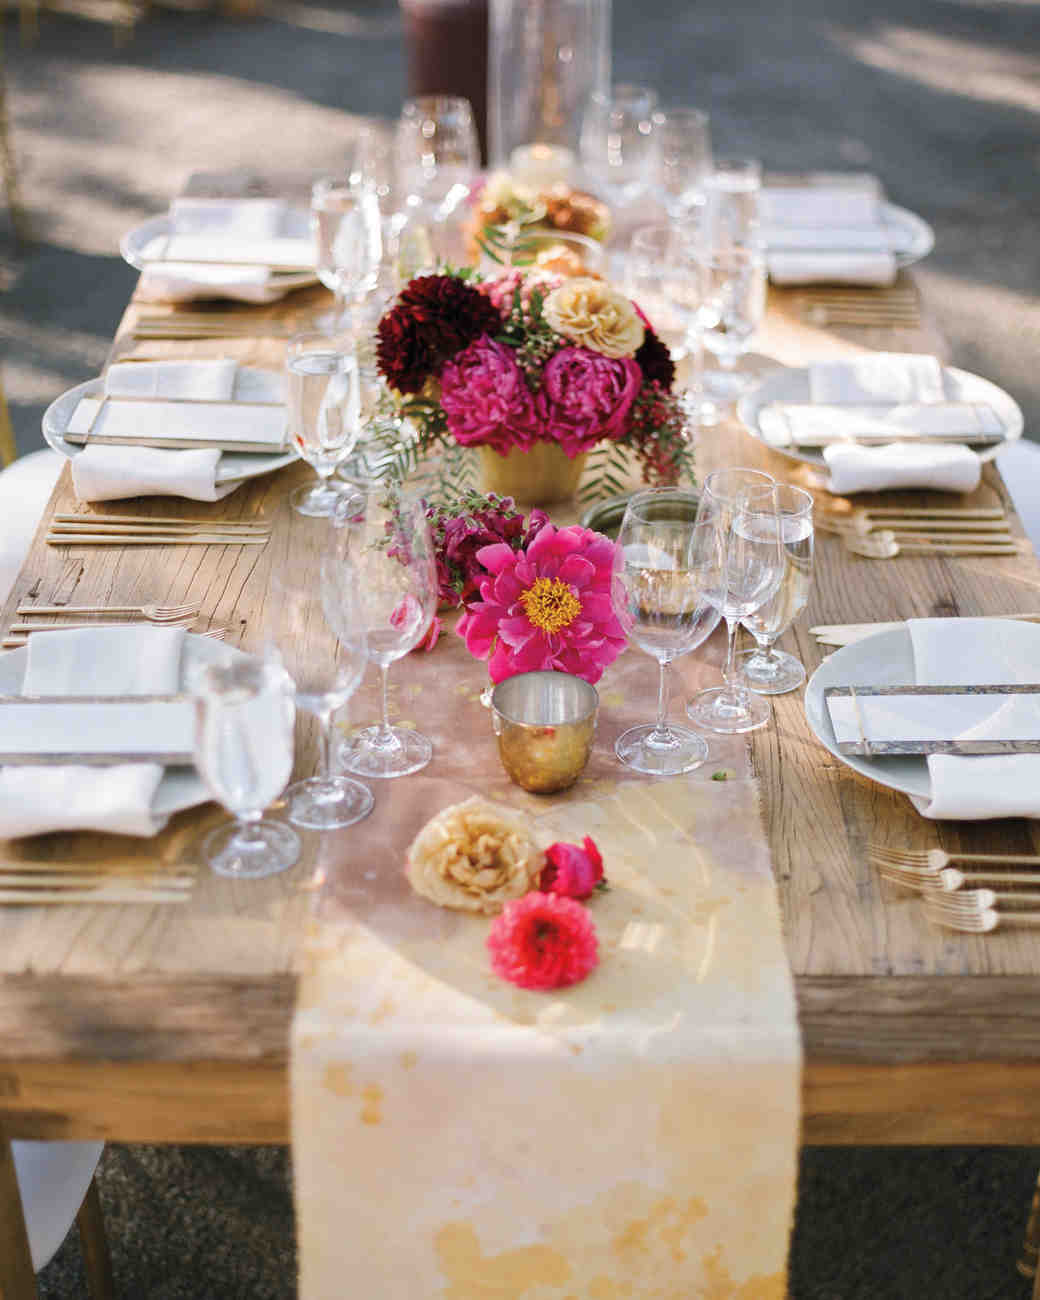 corrine-patrick-wedding-santa-ynez-44730001-s110842.jpg